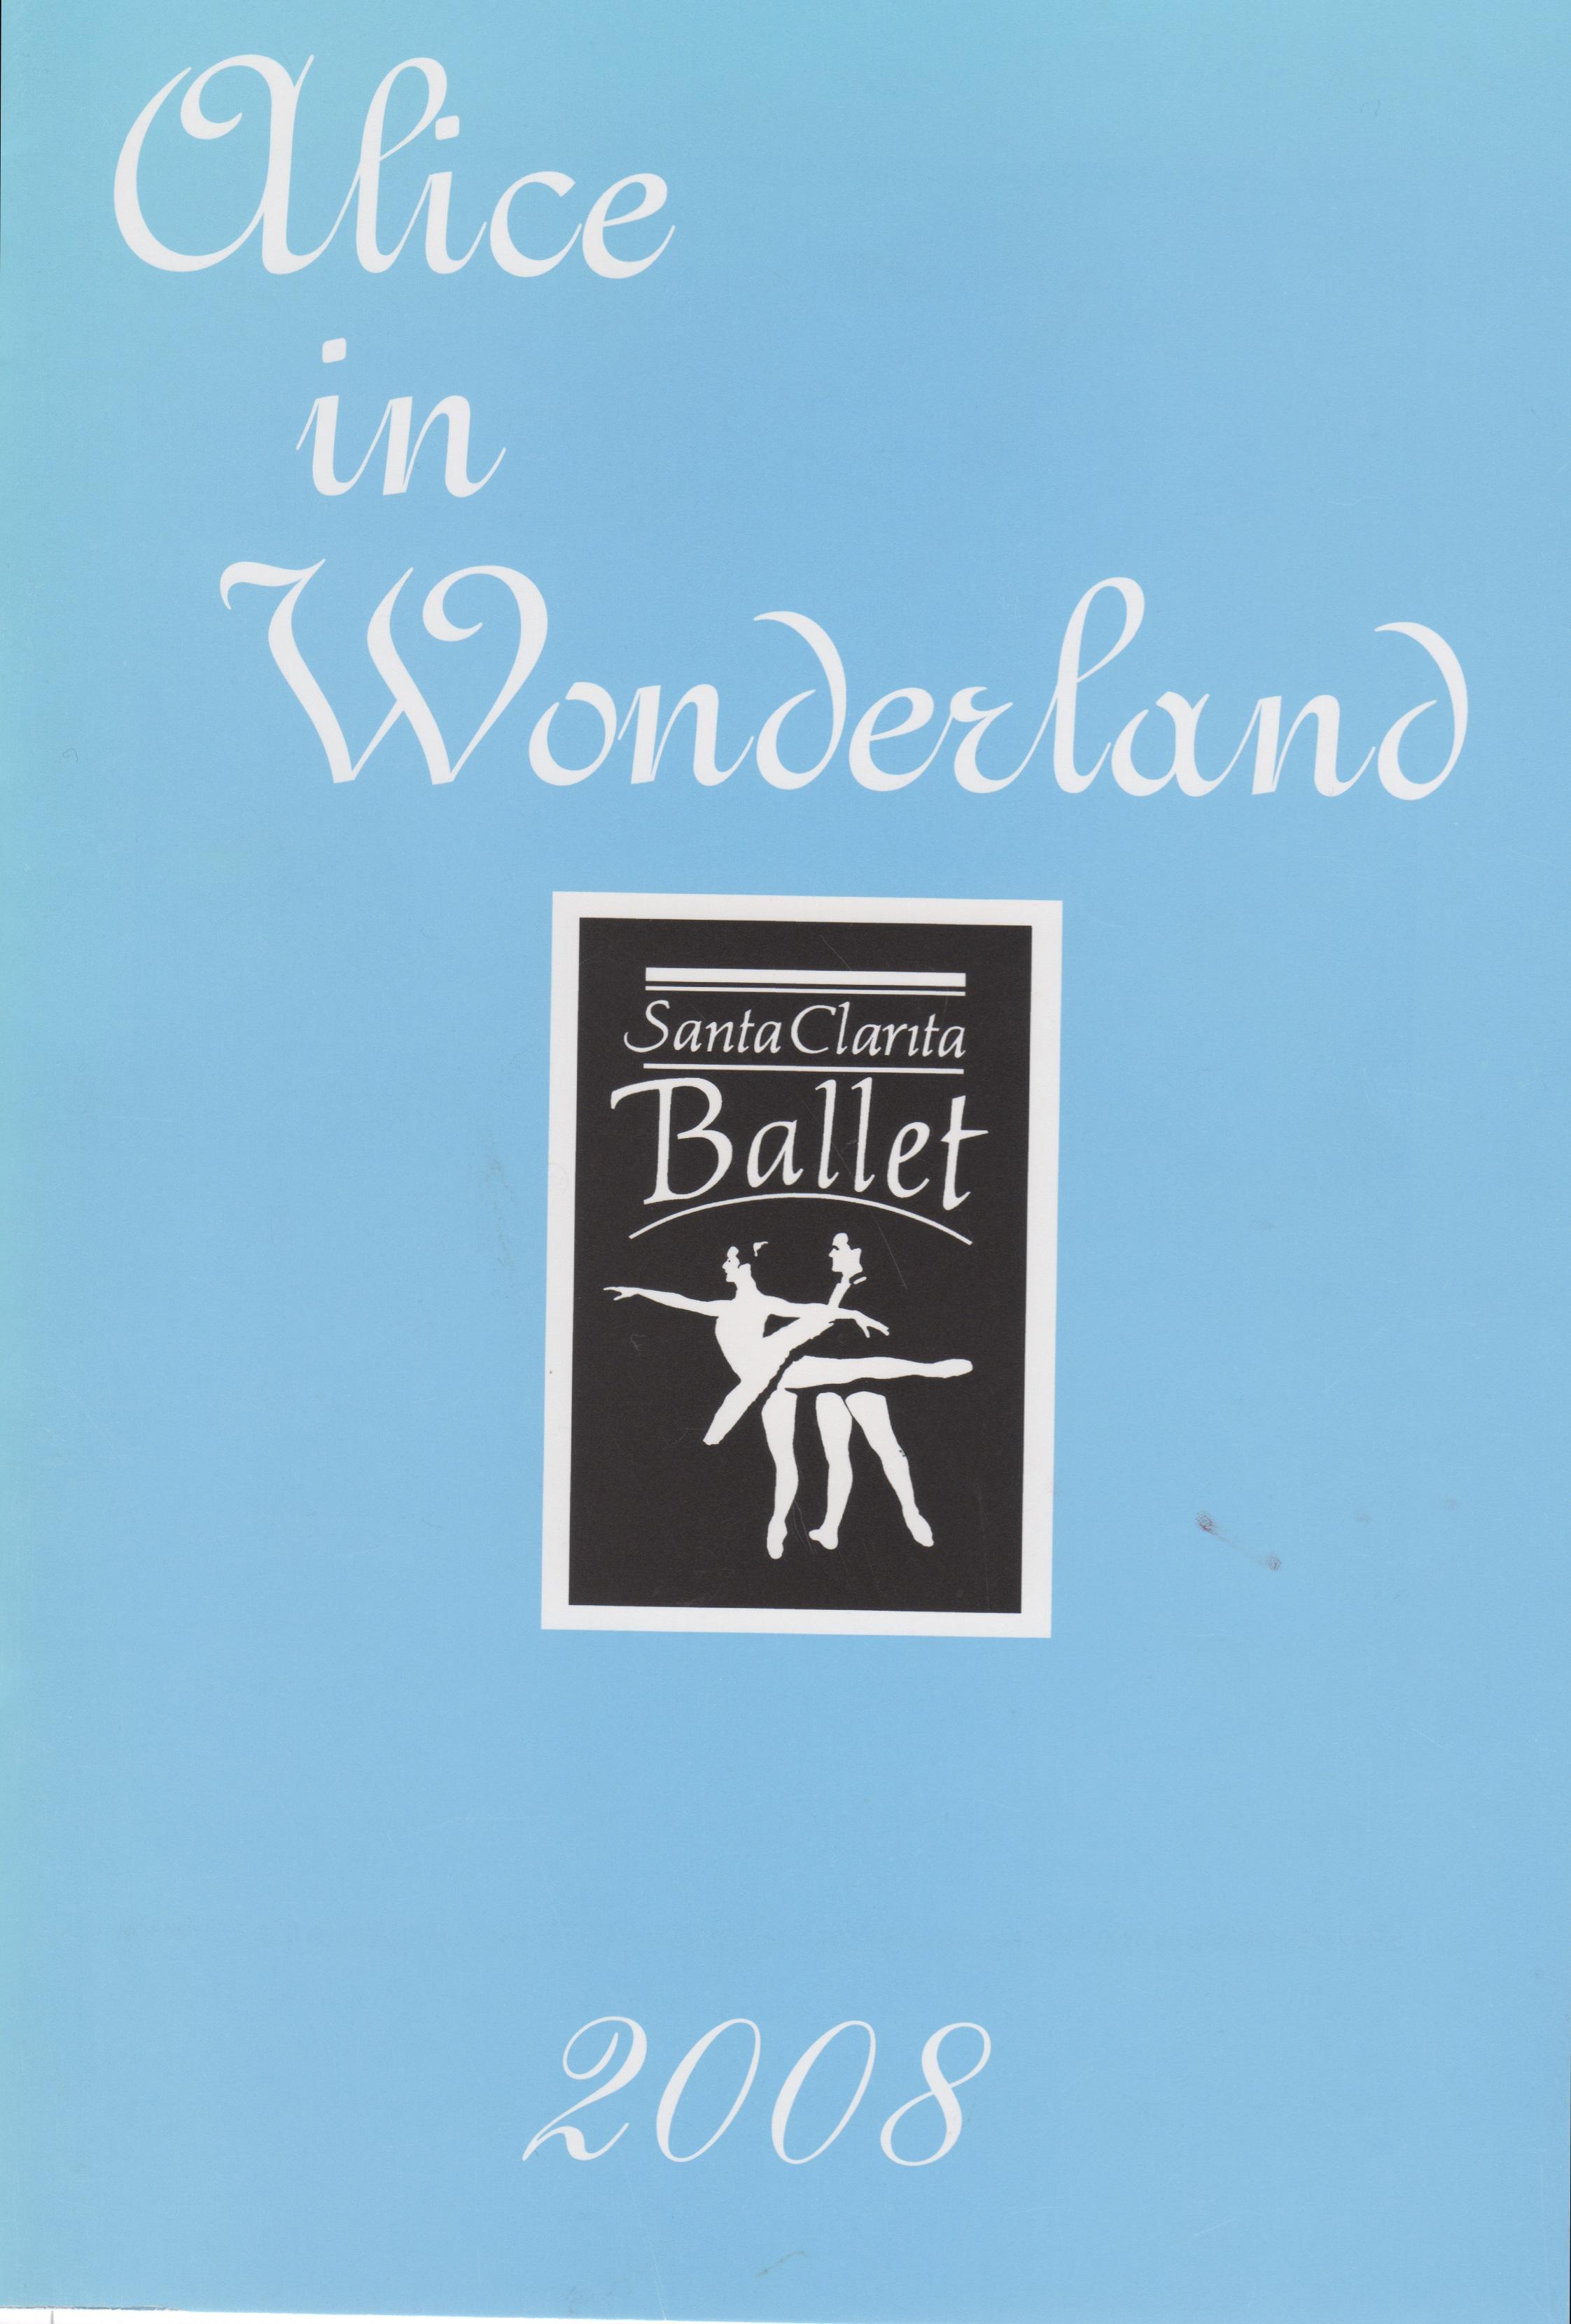 Alice in Wonderland 2008.jpeg